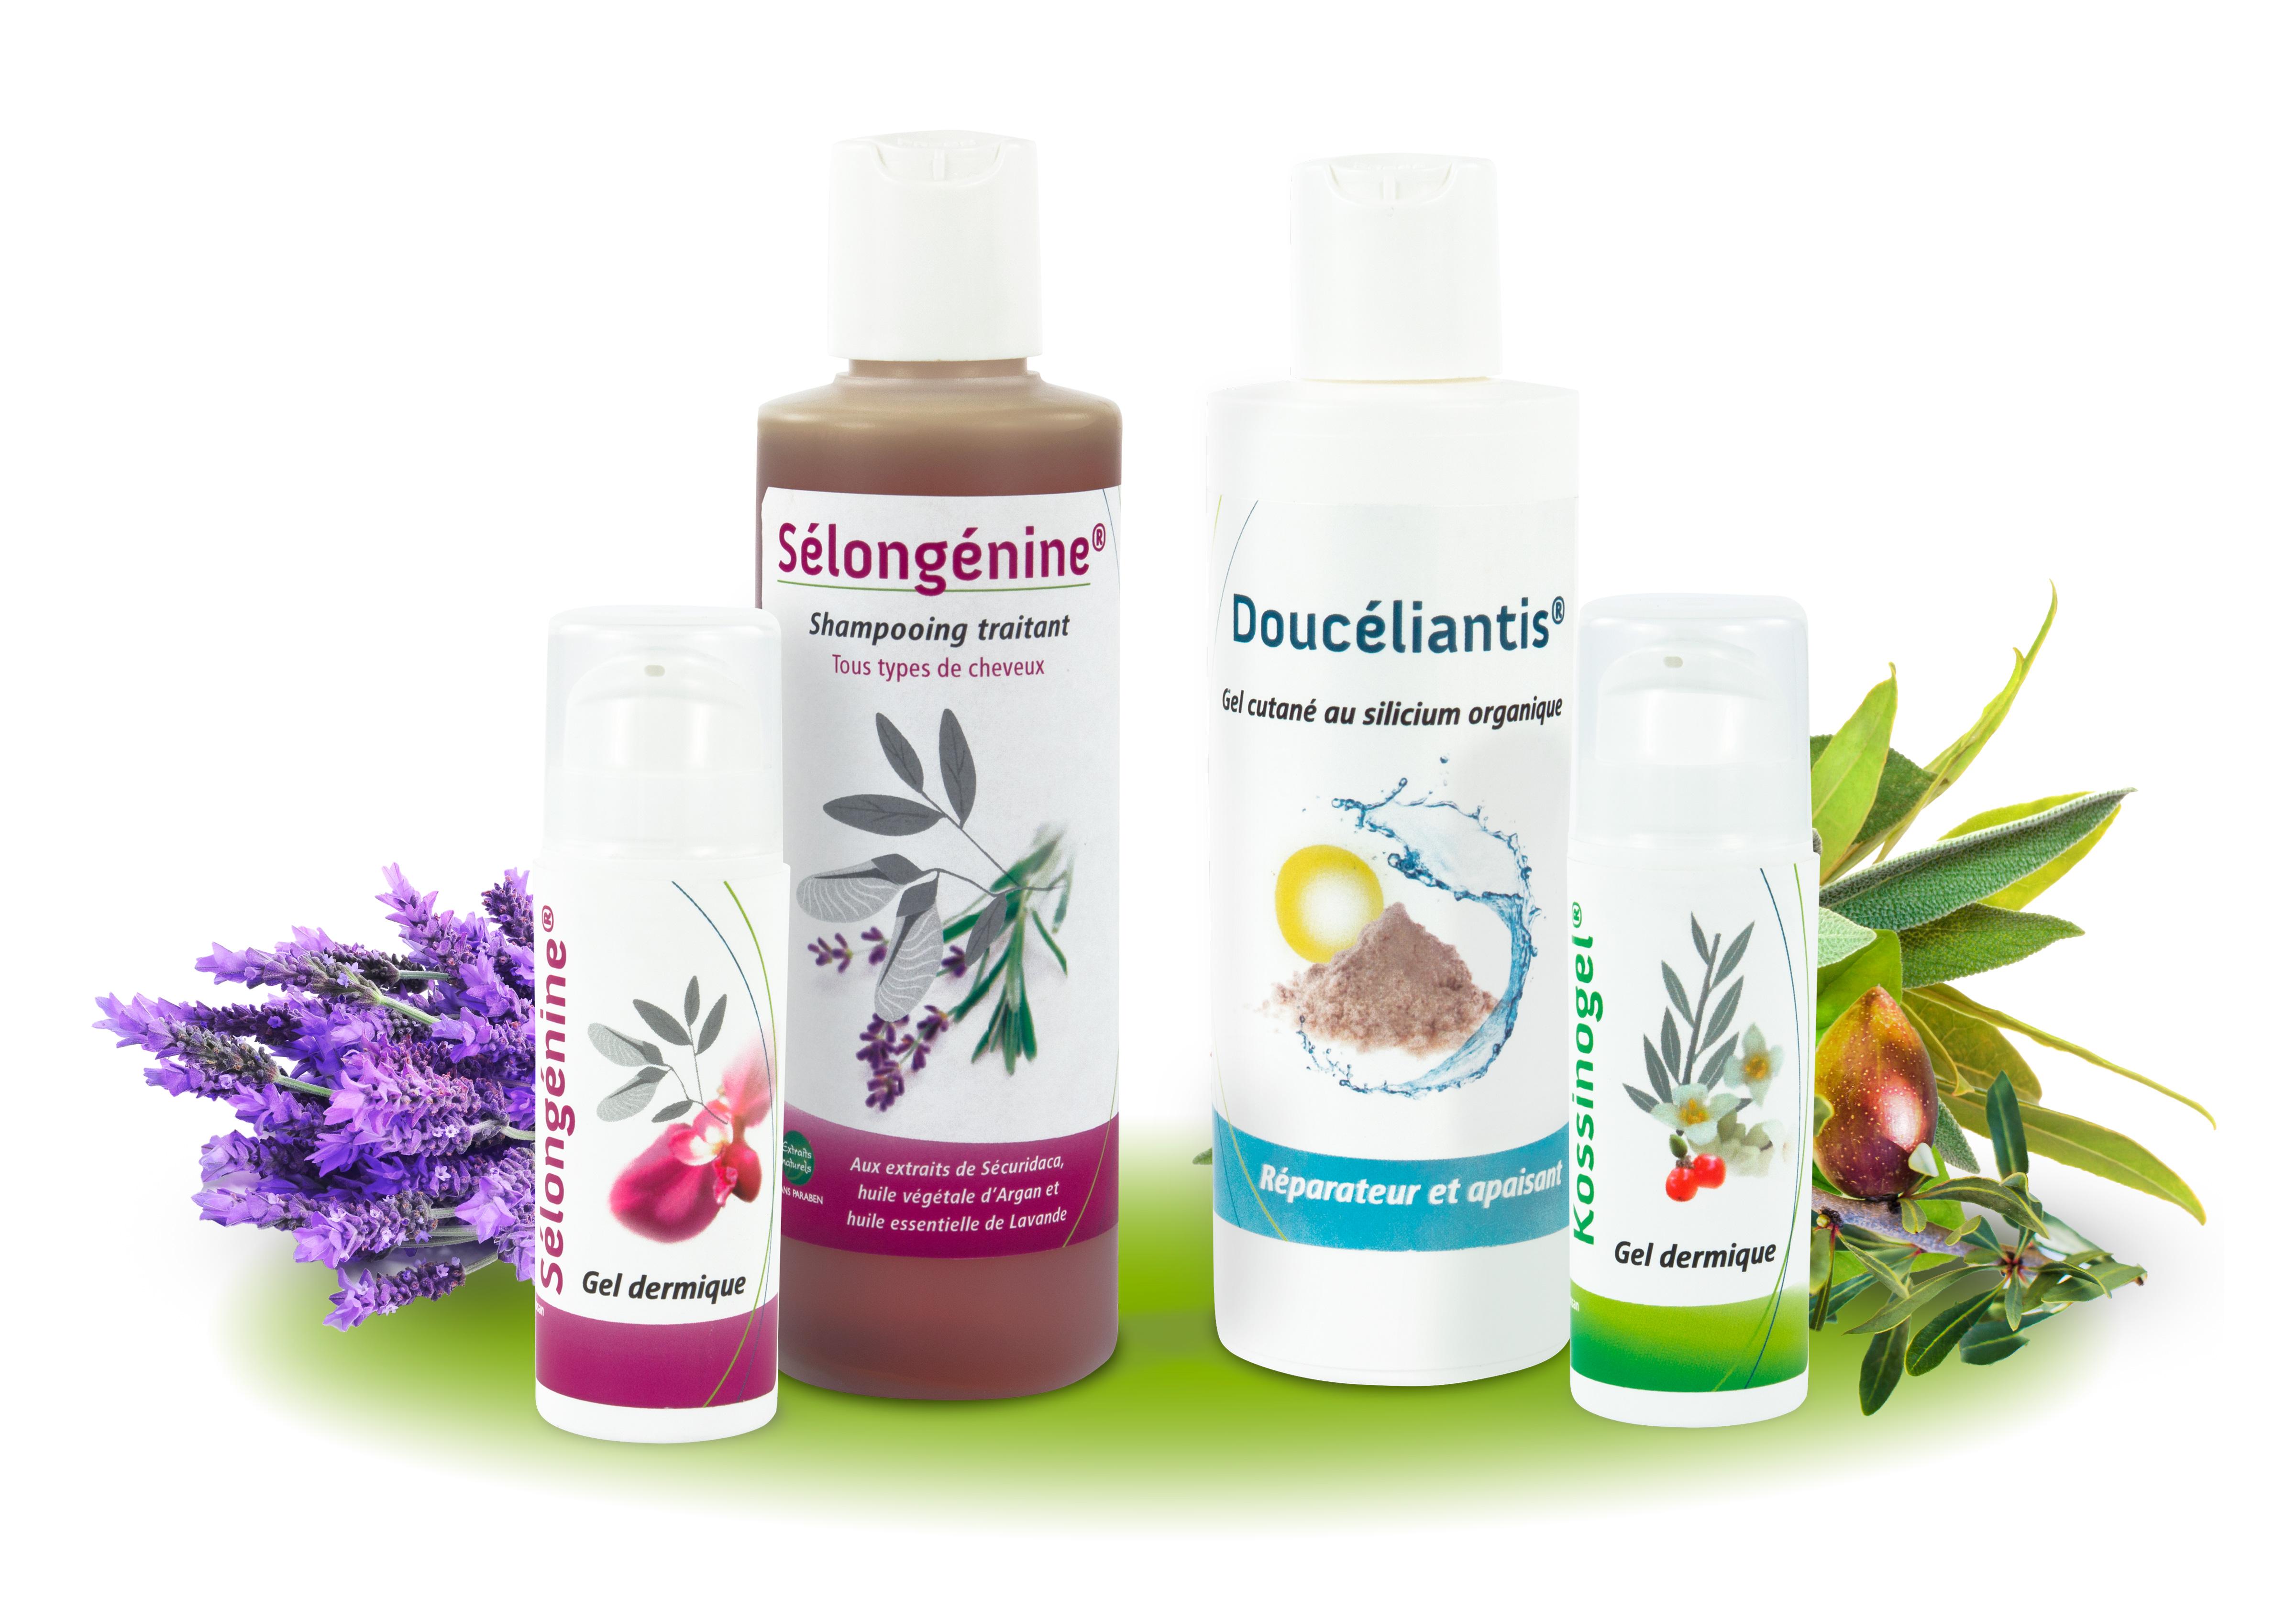 Promo gamme dermo cosmétique